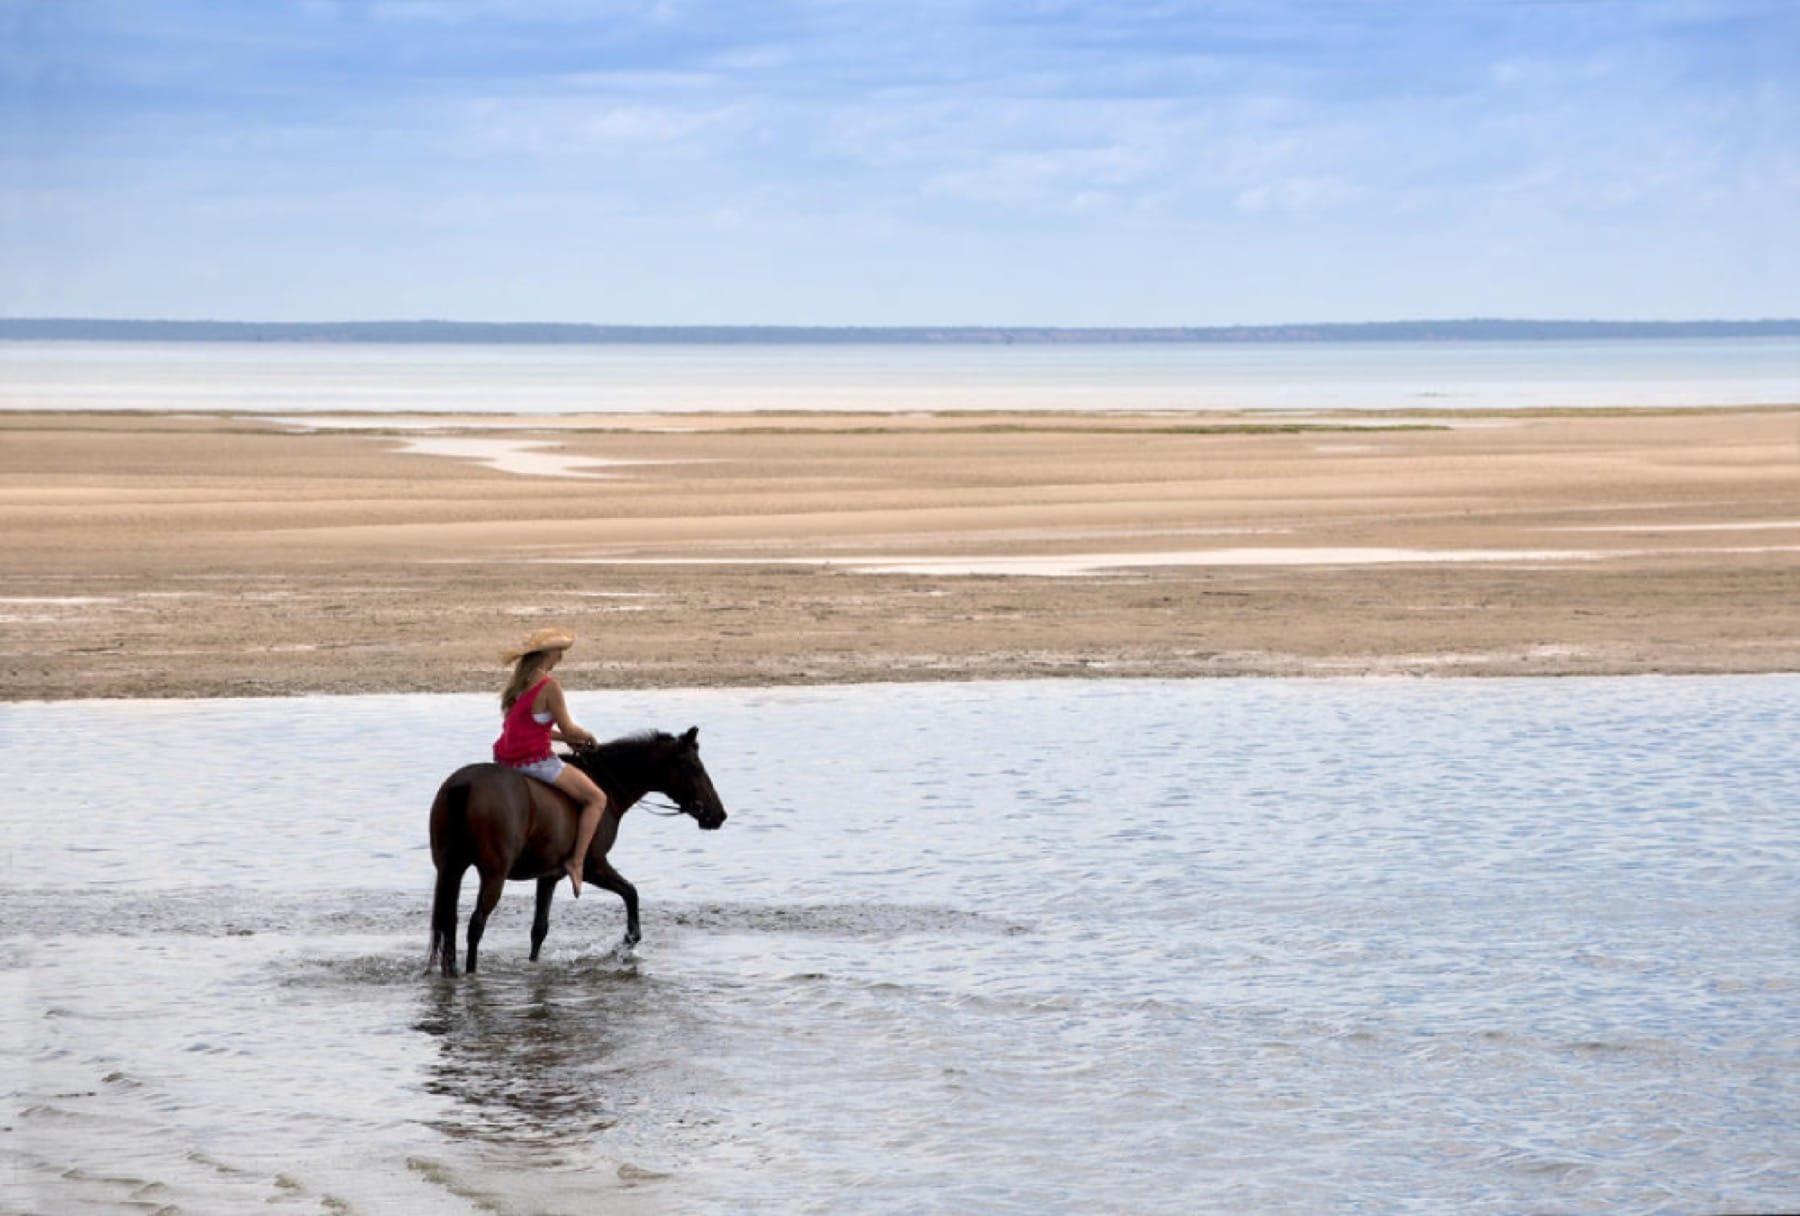 horseback beach mozambique holiday benguerra island